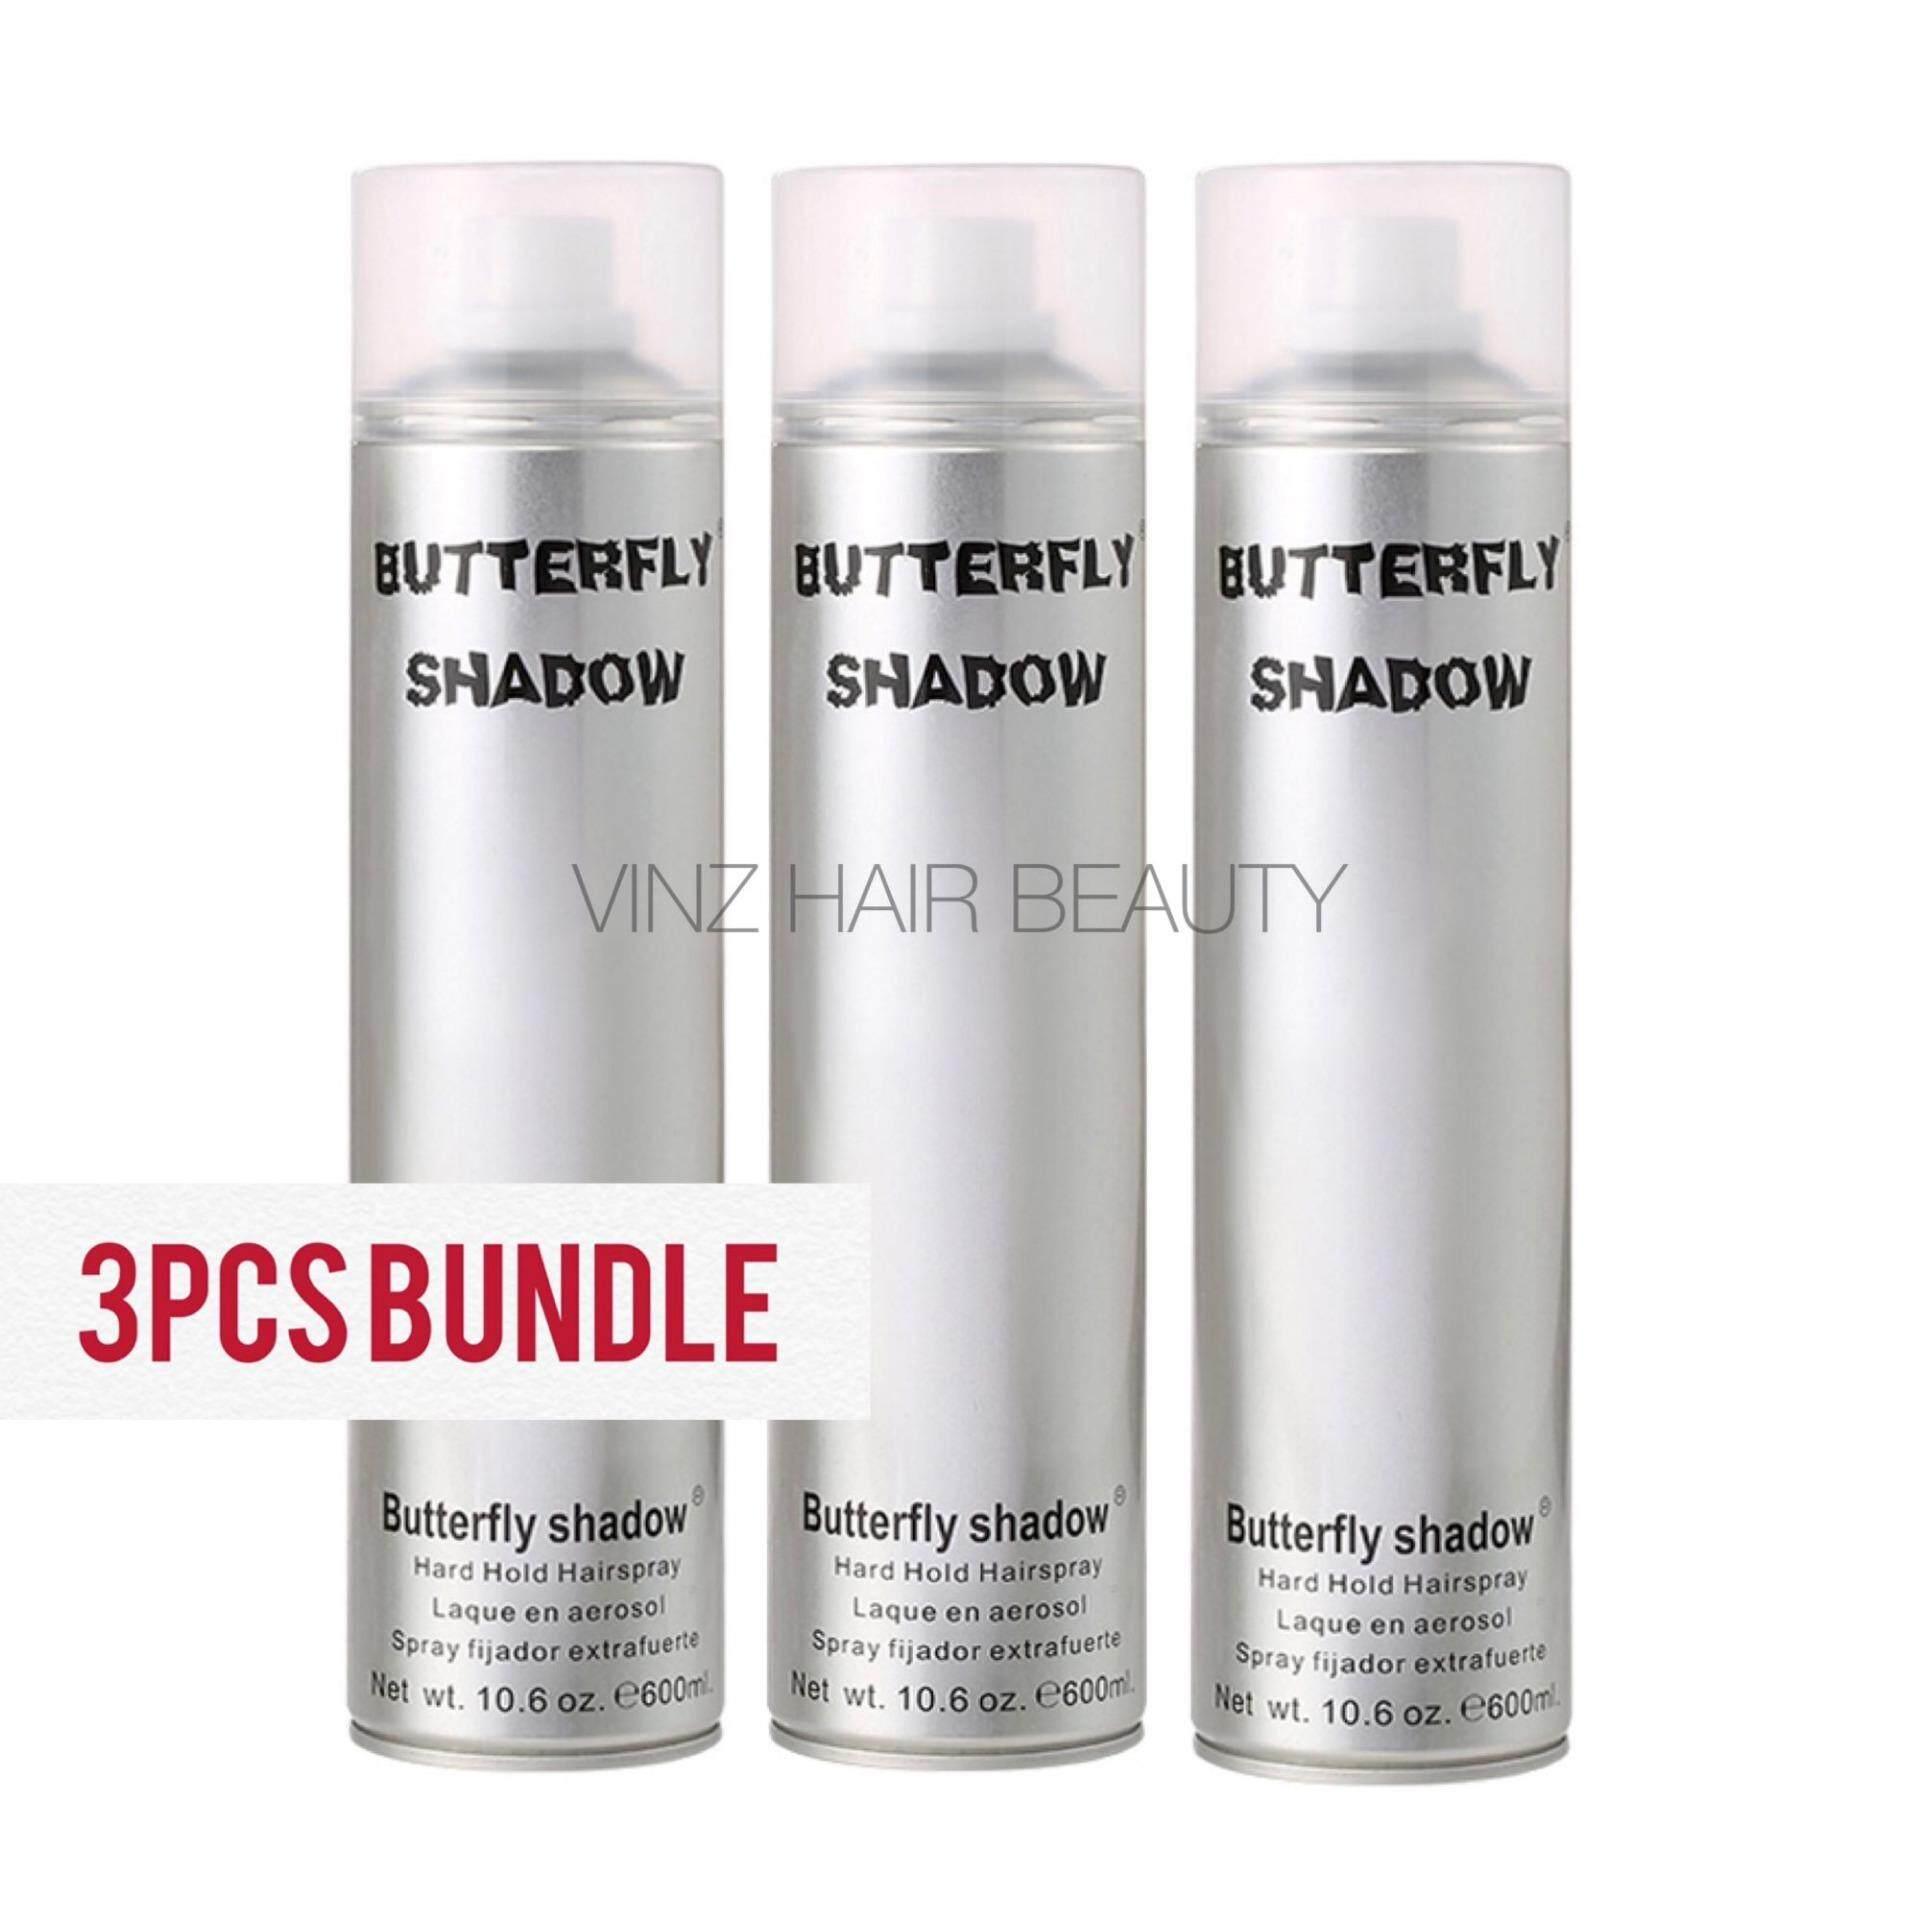 3PCS BUNDLE Butterfly Shadows Hairspray 600ml